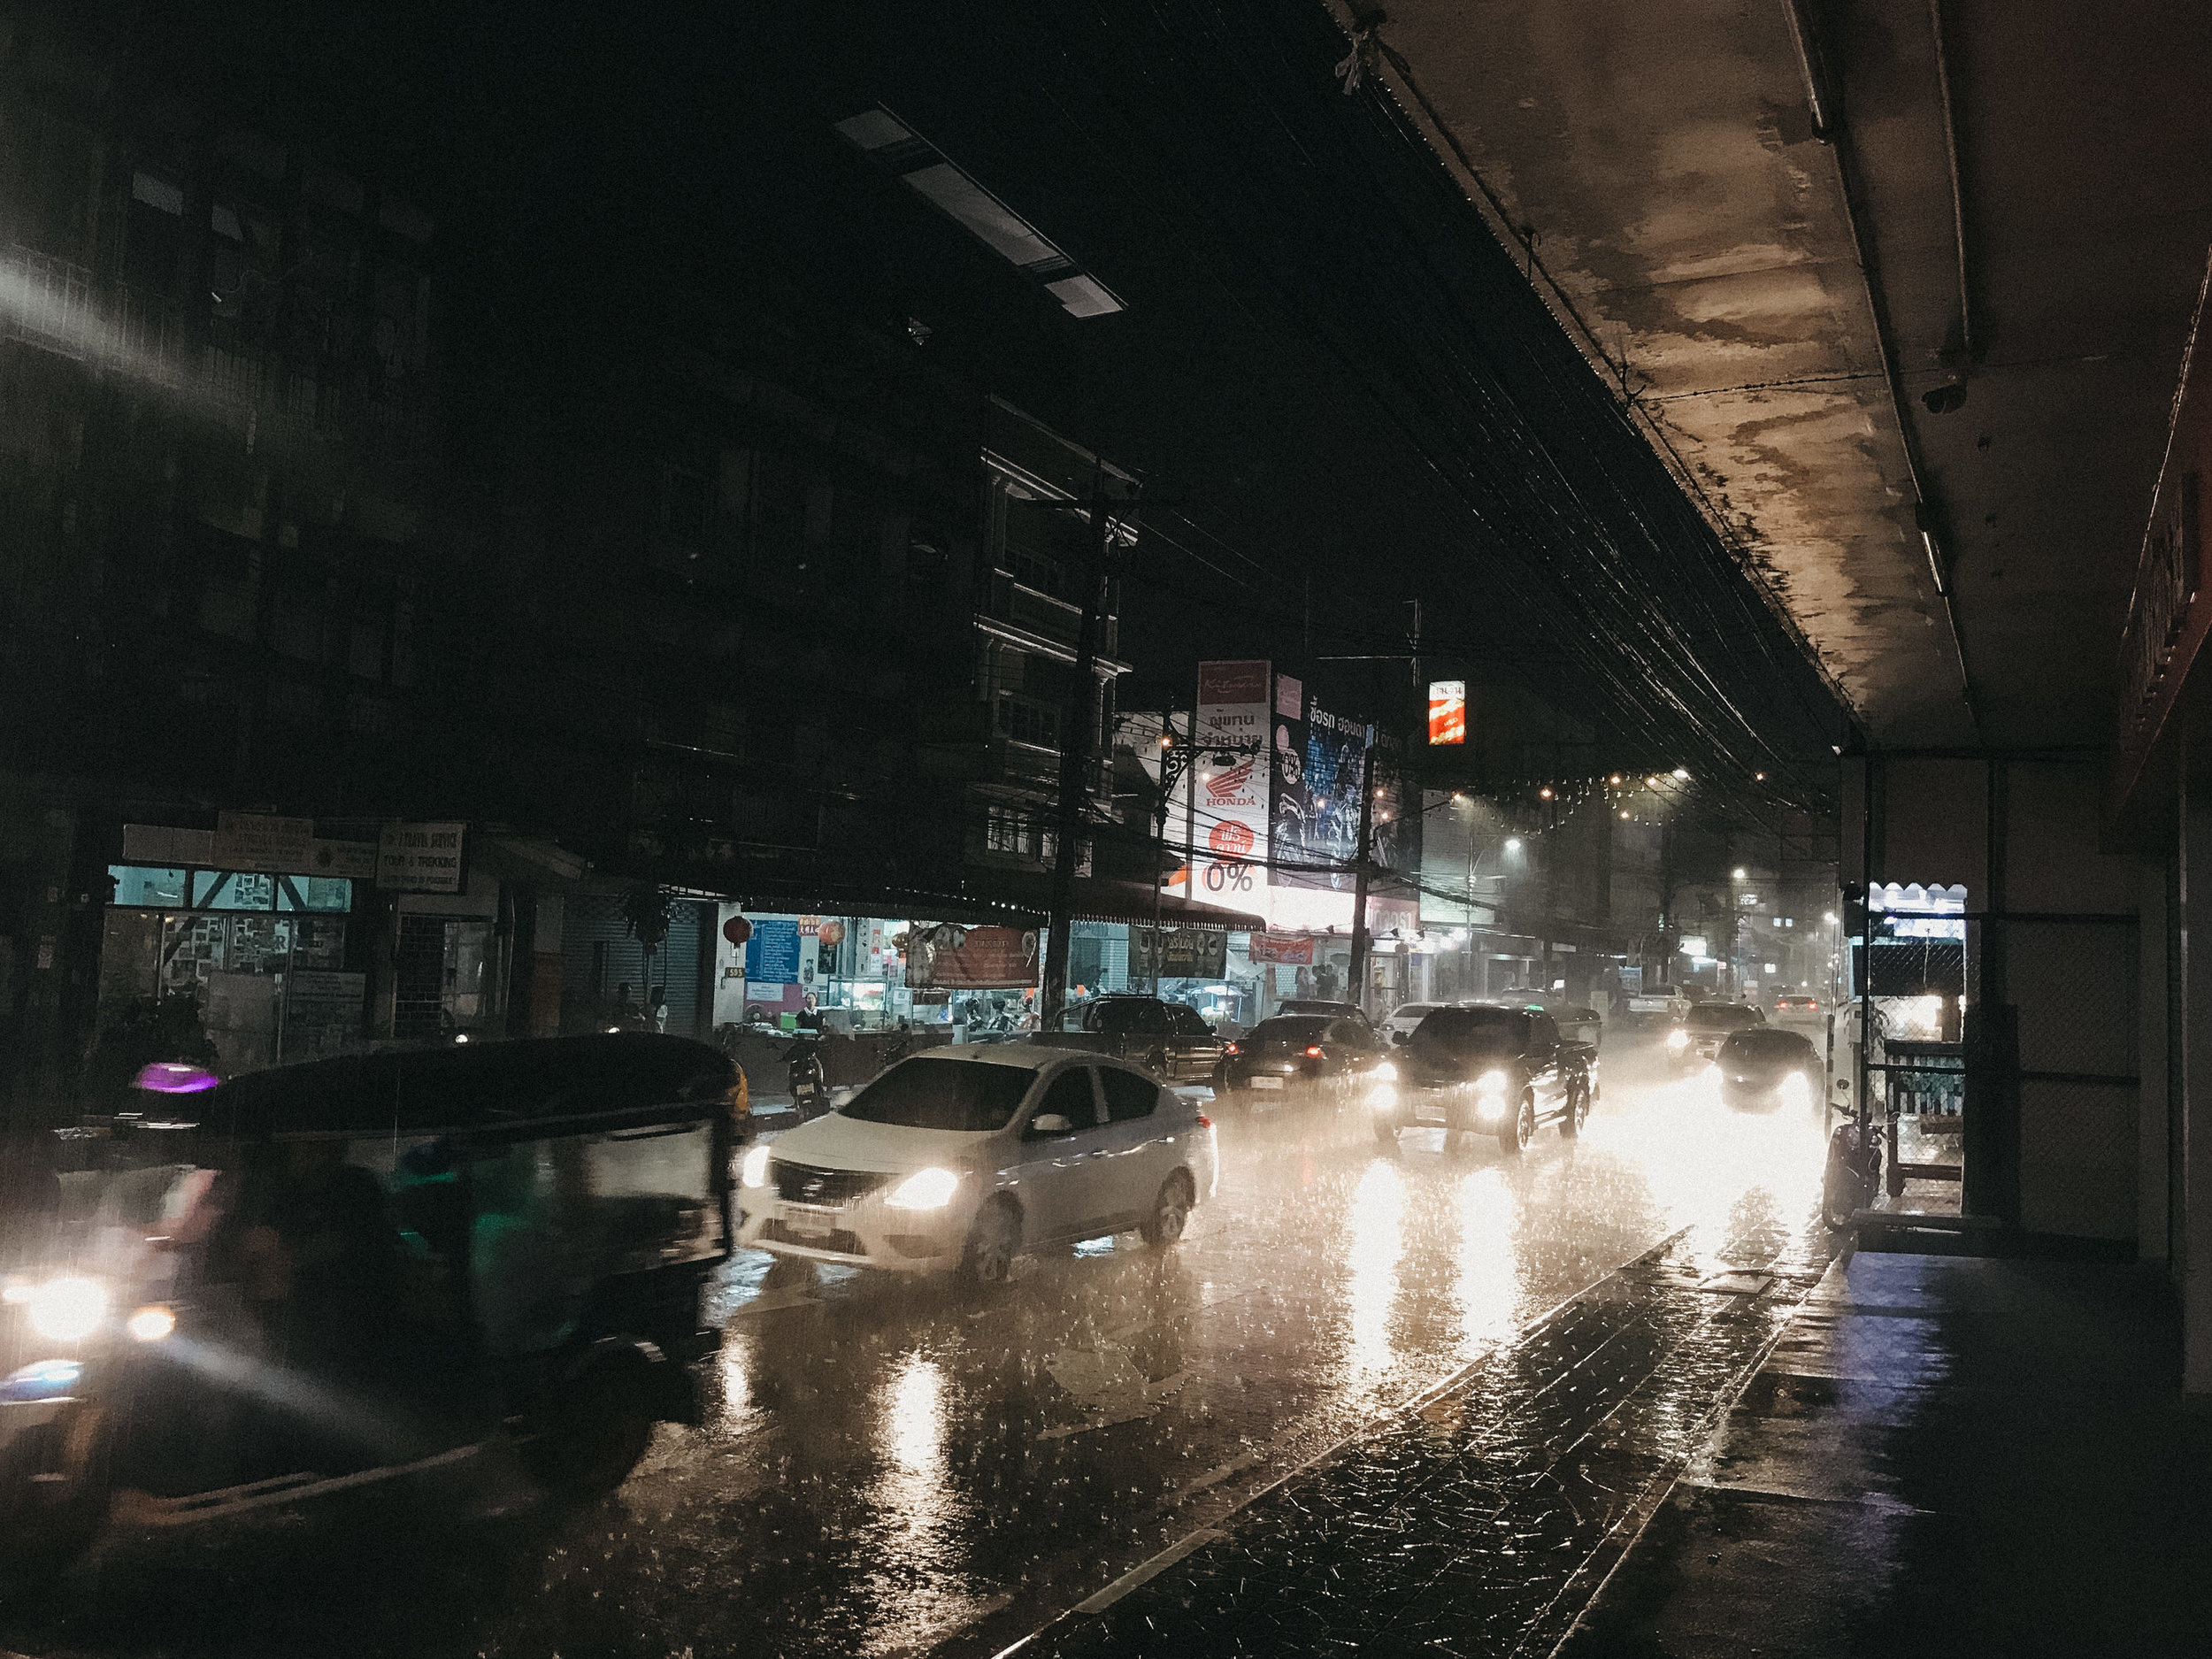 thailand-59.jpg